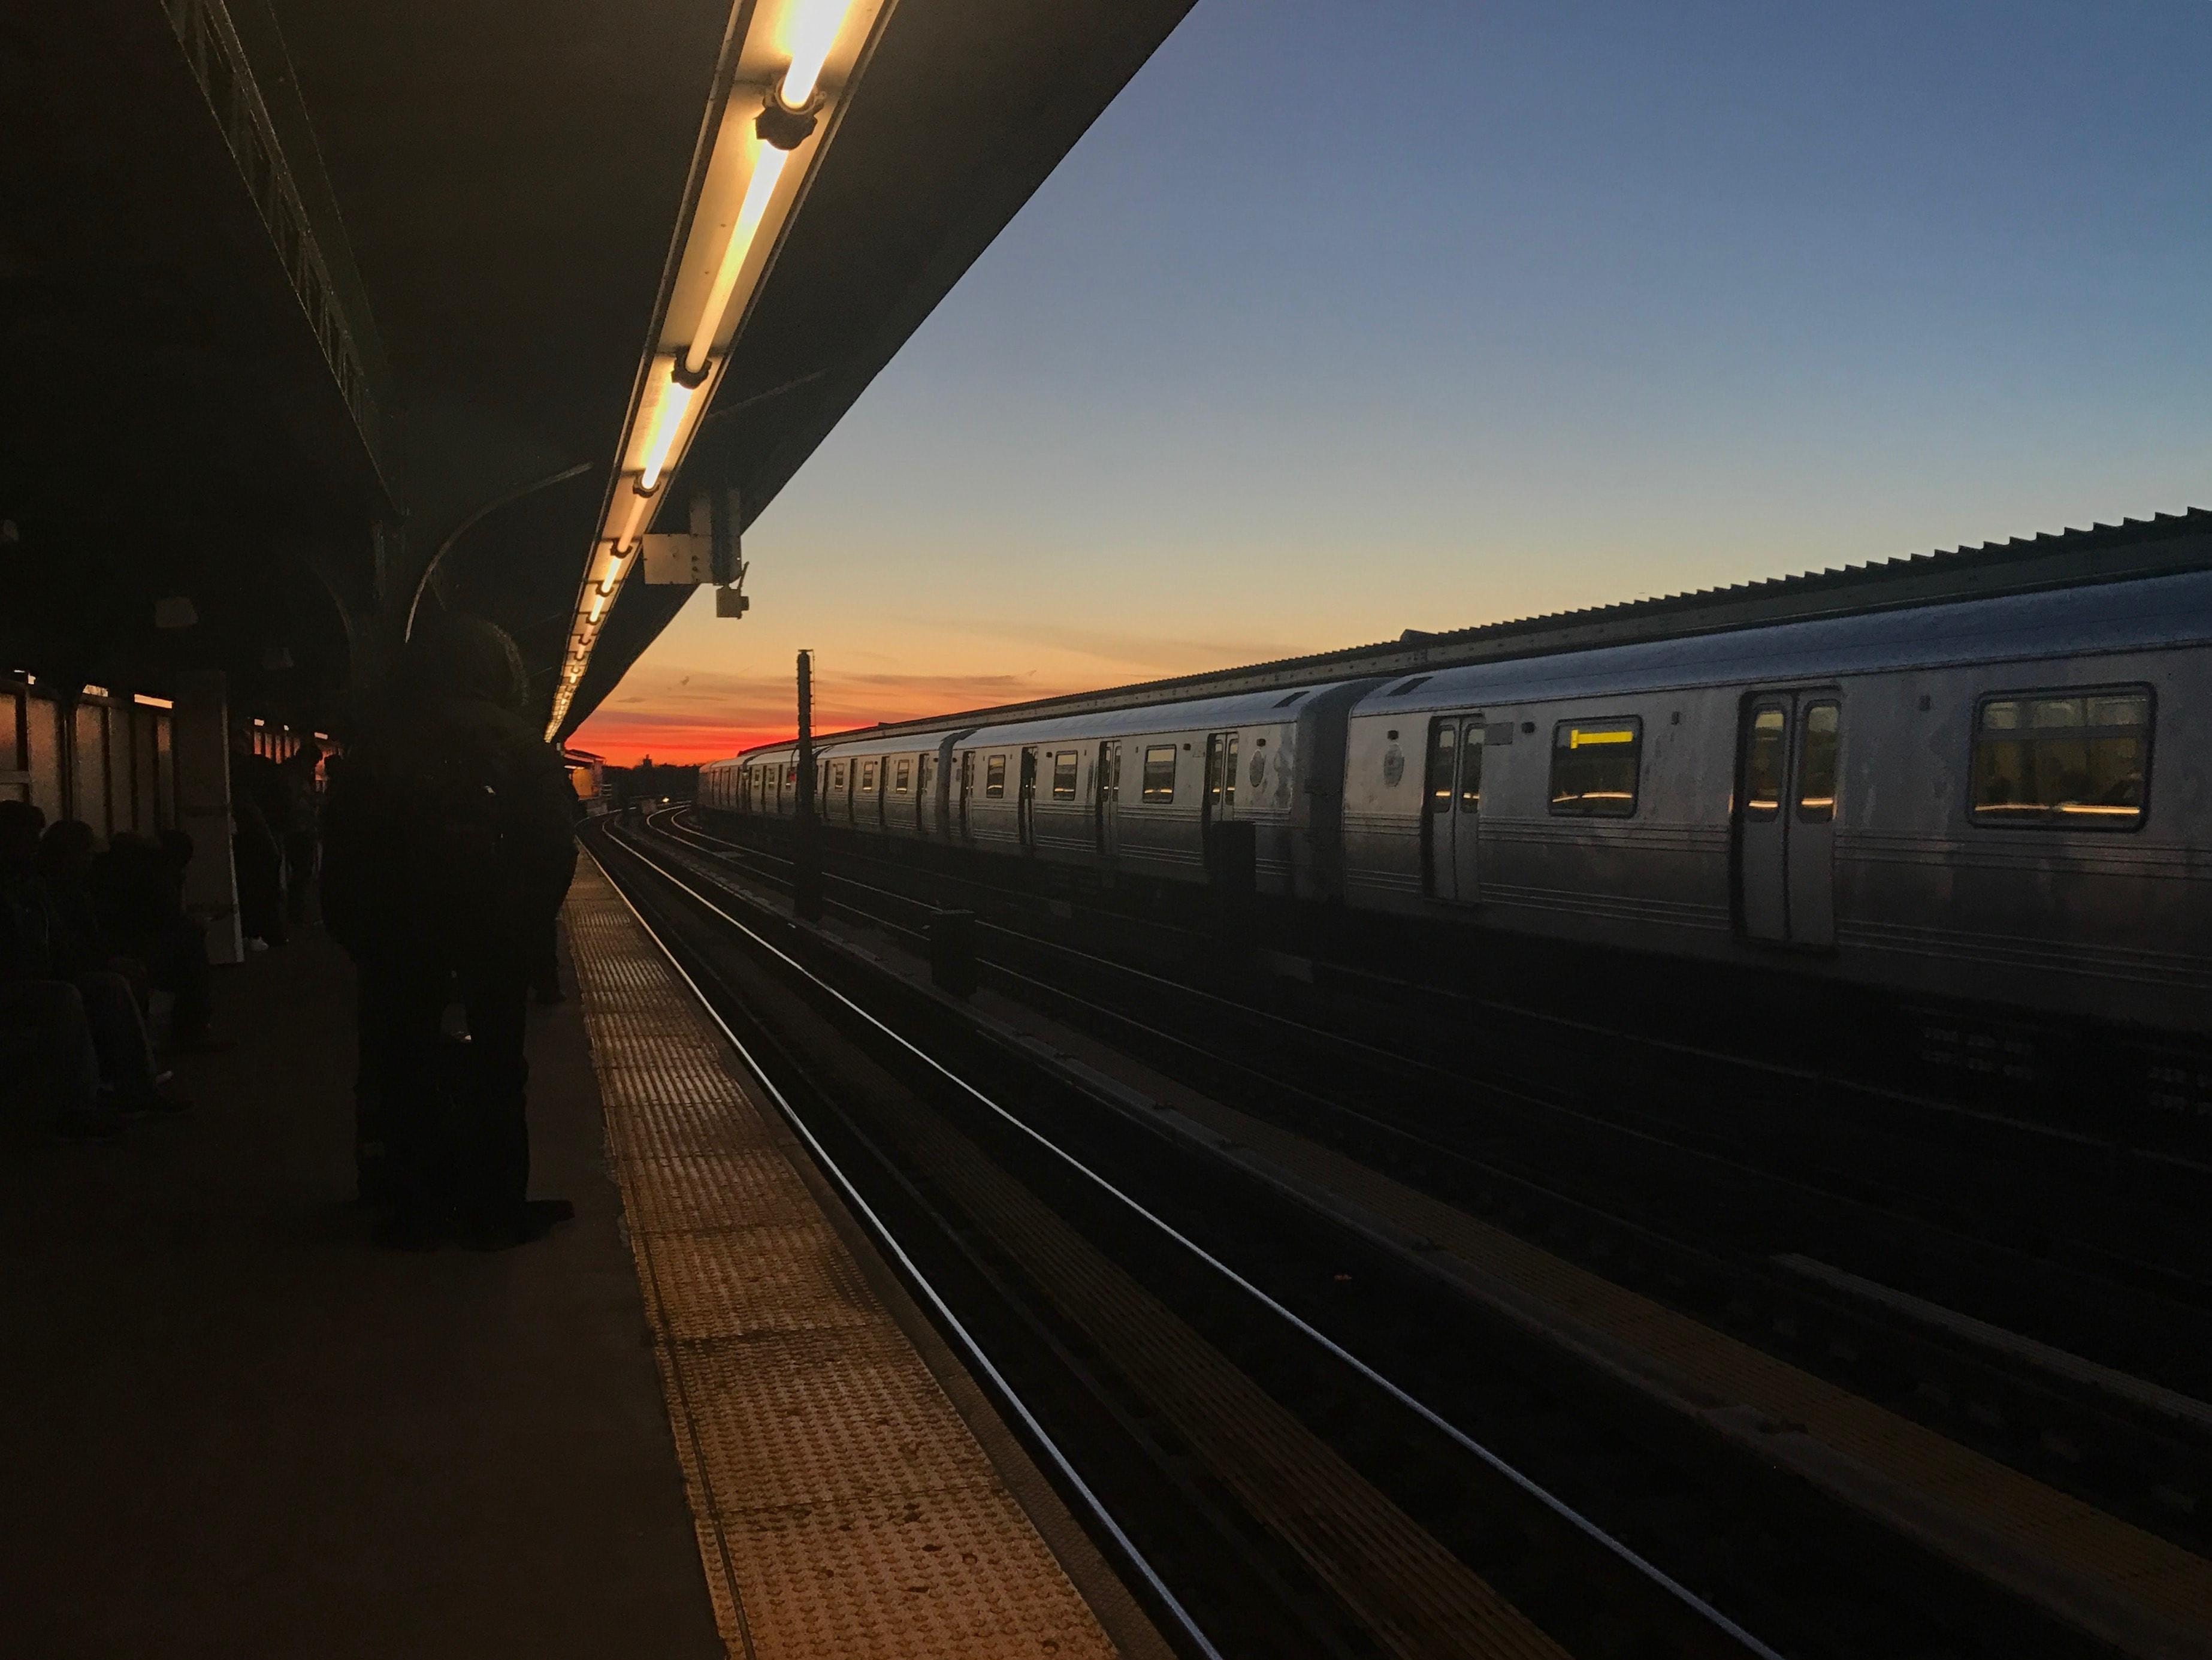 Sunset at Train at subway station in New York City